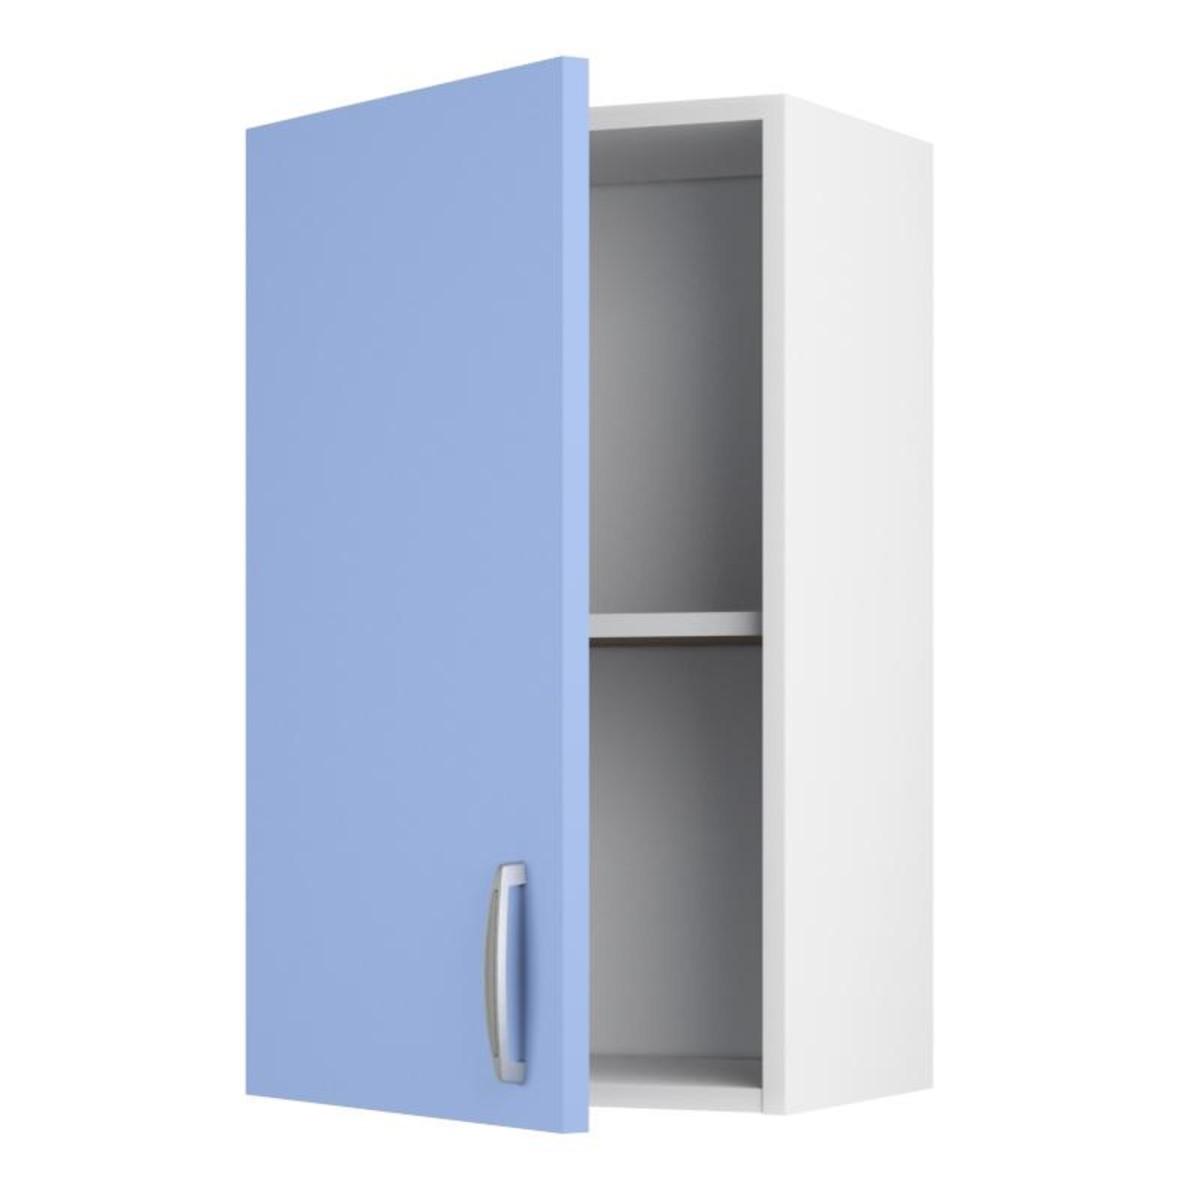 Шкаф навесной Лагуна Д 676х40 см цвет голубой